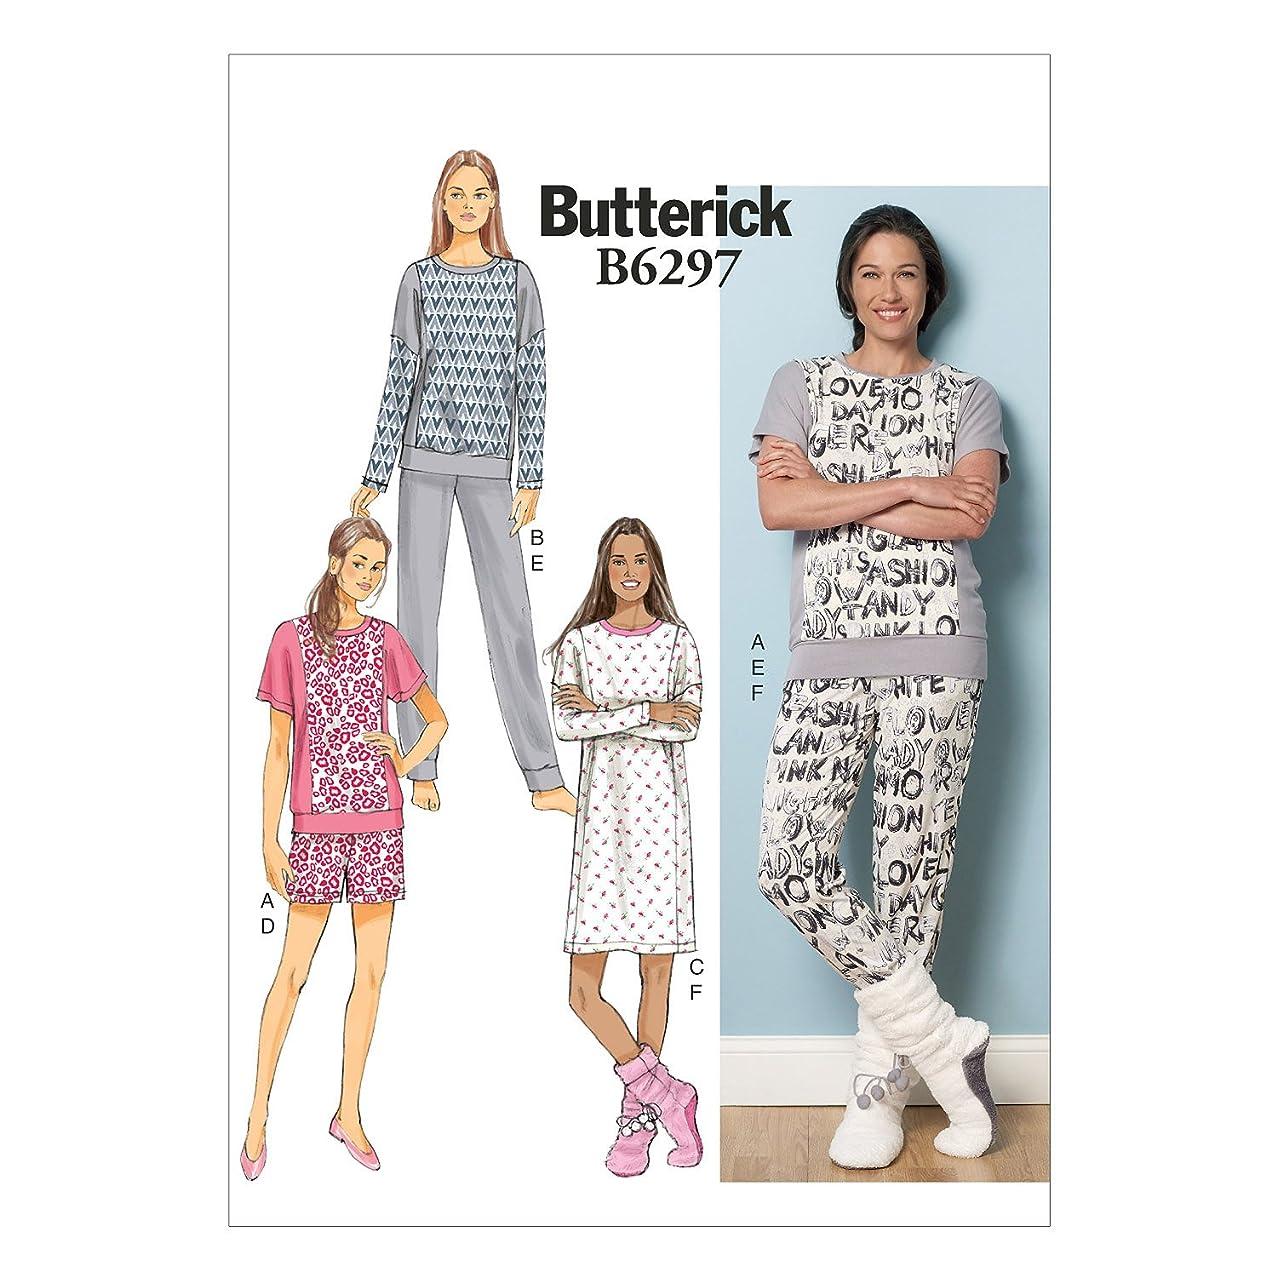 BUTTERICK PATTERNS B6297 Misses' Top, Dress, Shorts, Pants & Lounge Socks, ZZ (Large-X-Large-XX-Large)